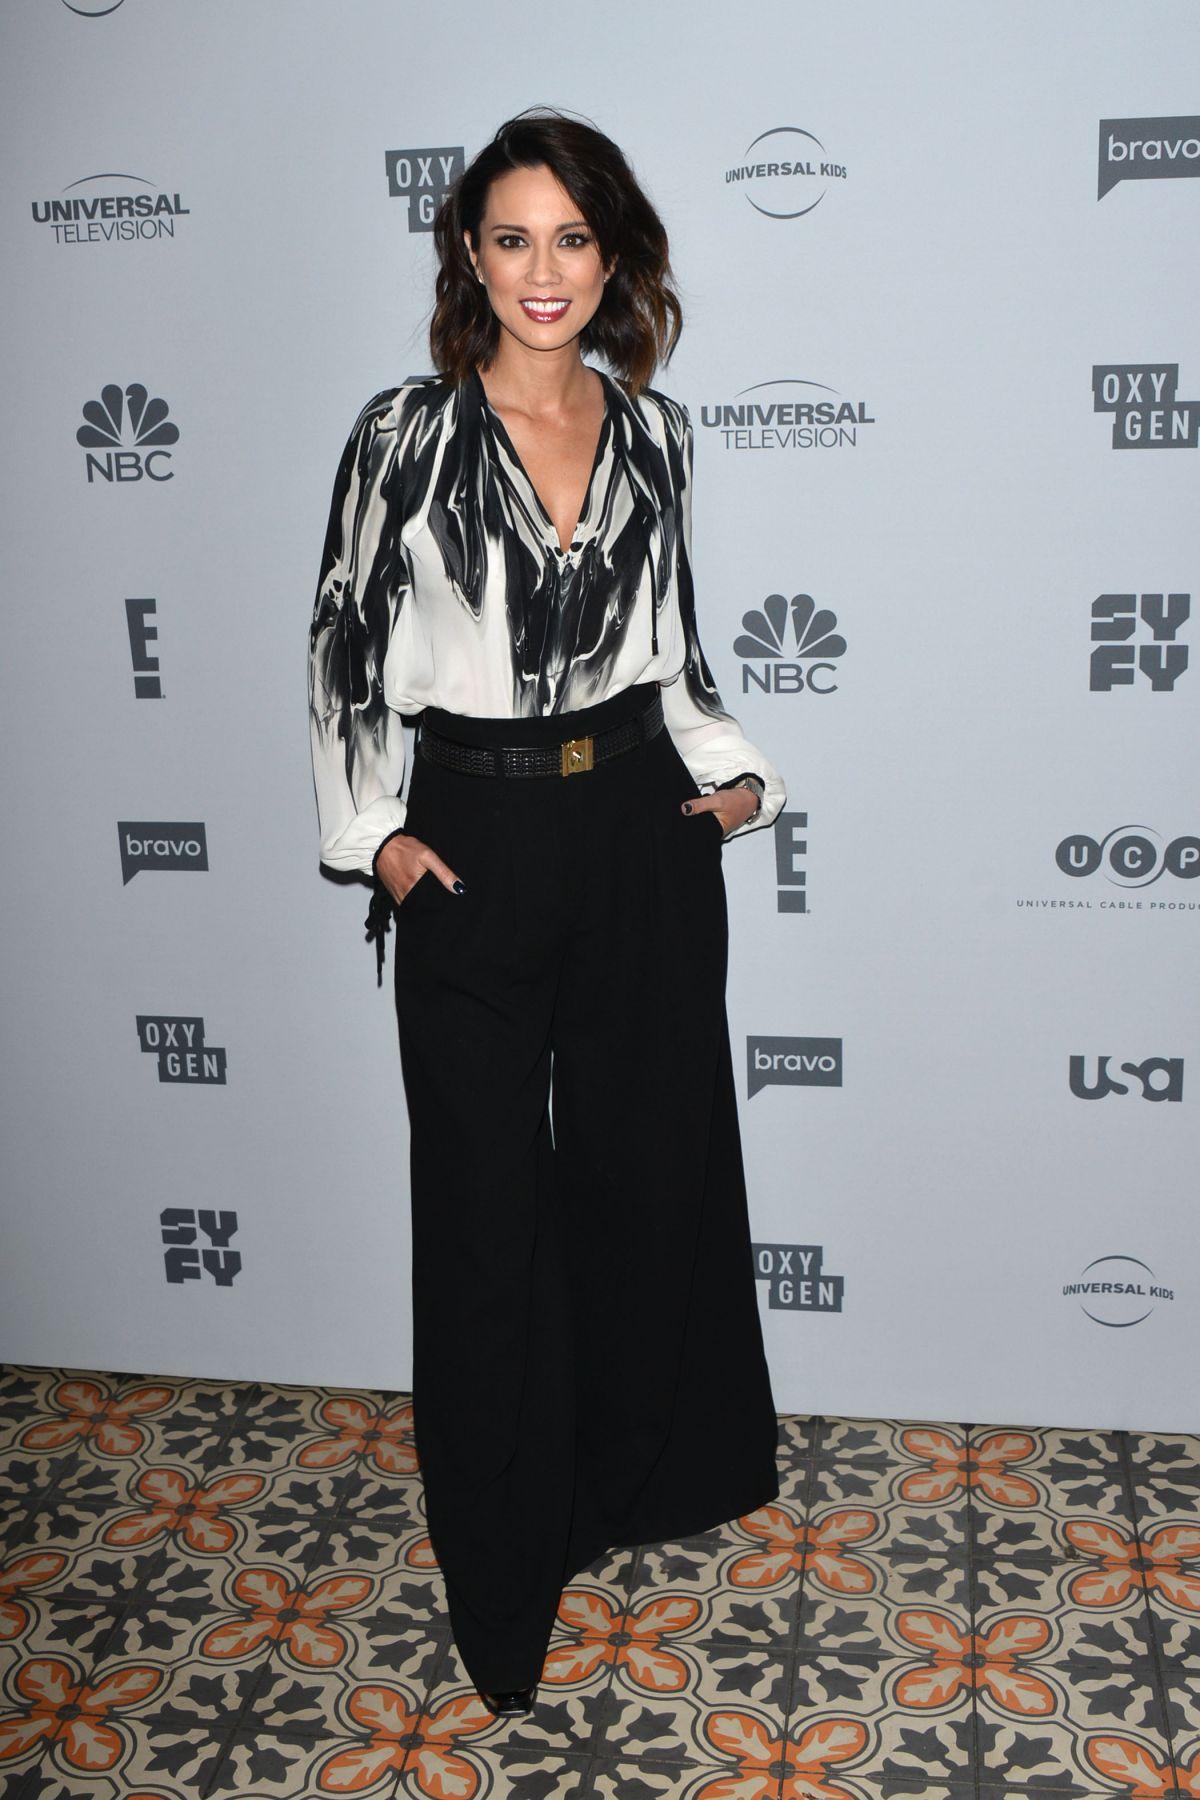 Lexa Doig | Style, Image, Actresses